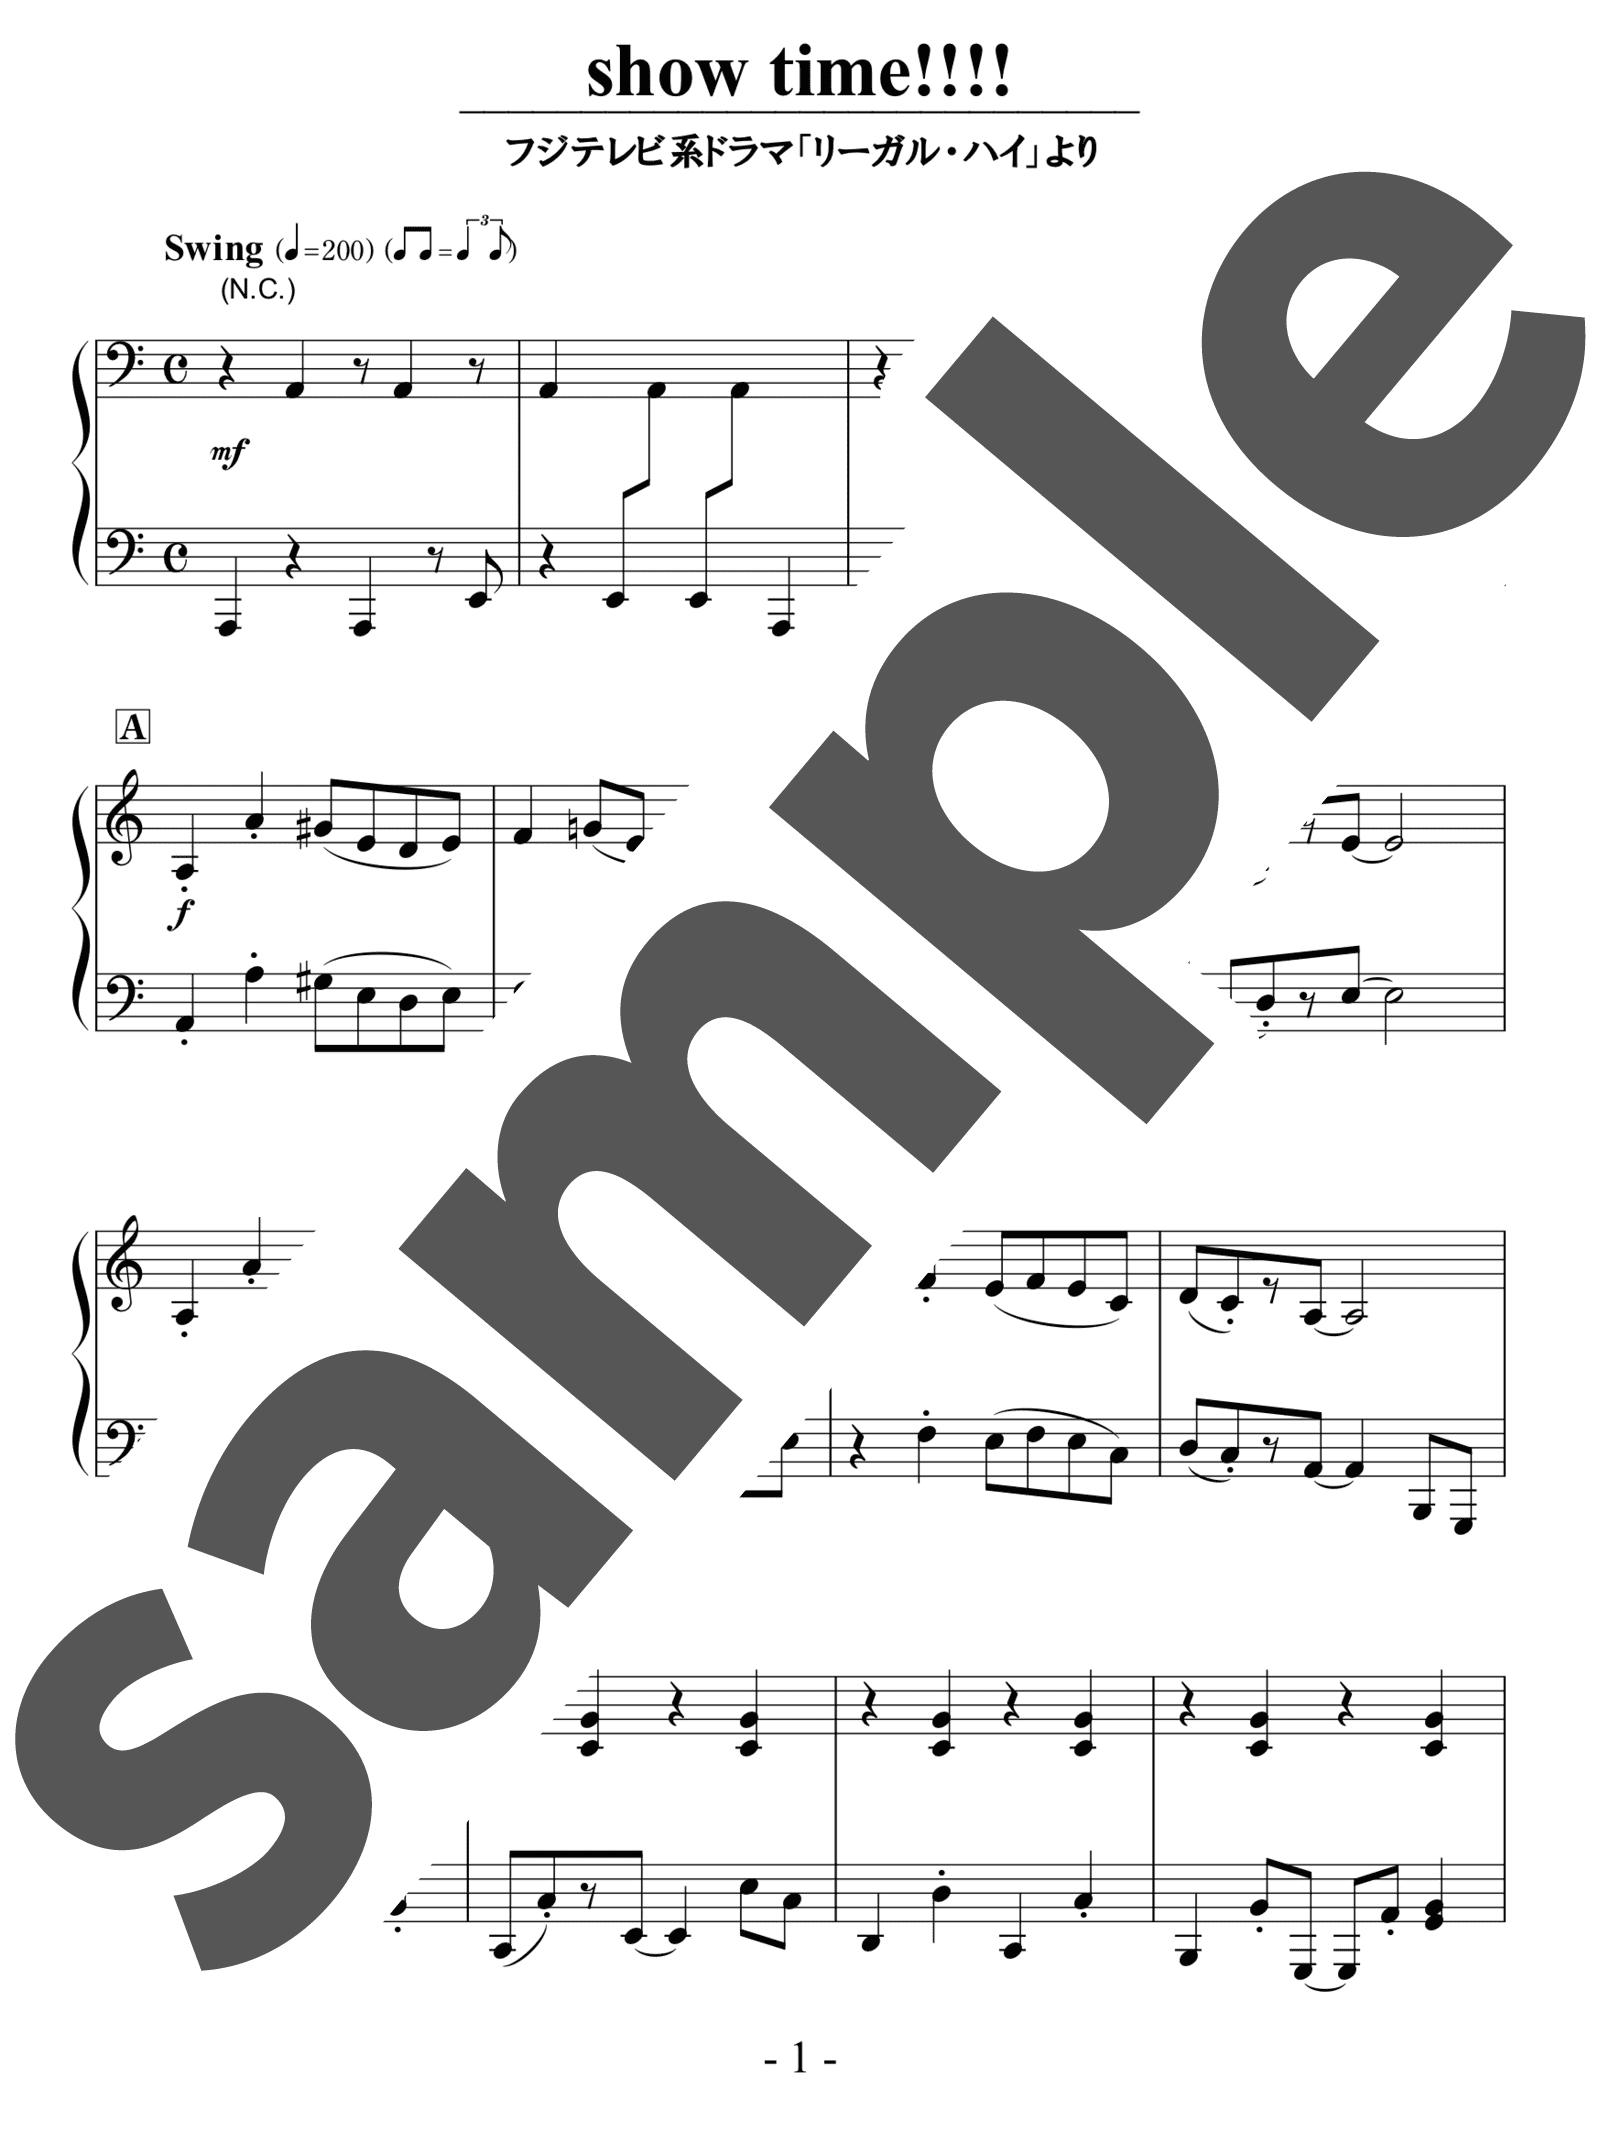 「show time !!!!」のサンプル楽譜